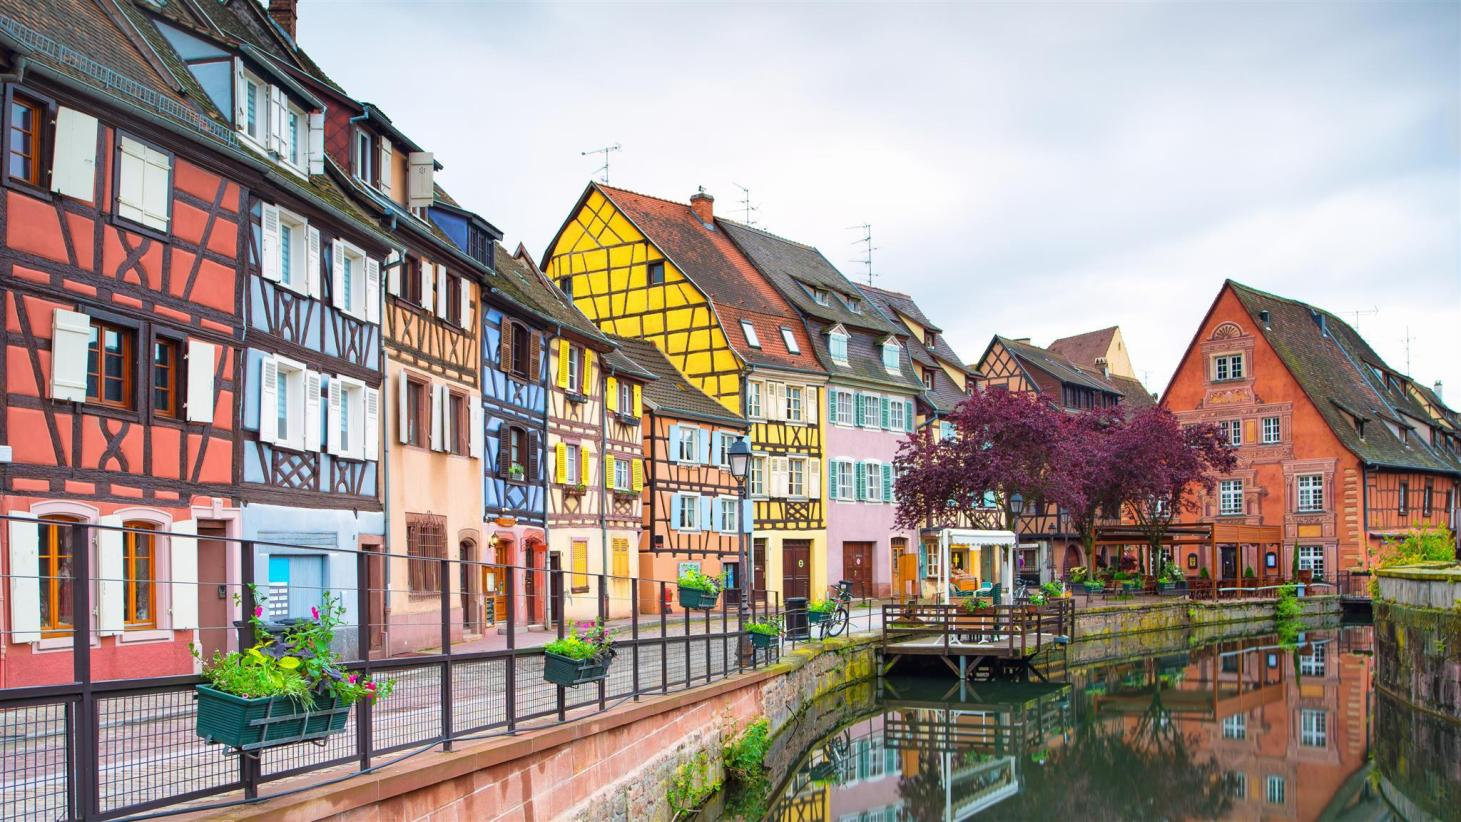 10 Best Colmar Hotels Hd Photos Reviews Of Hotels In Colmar France